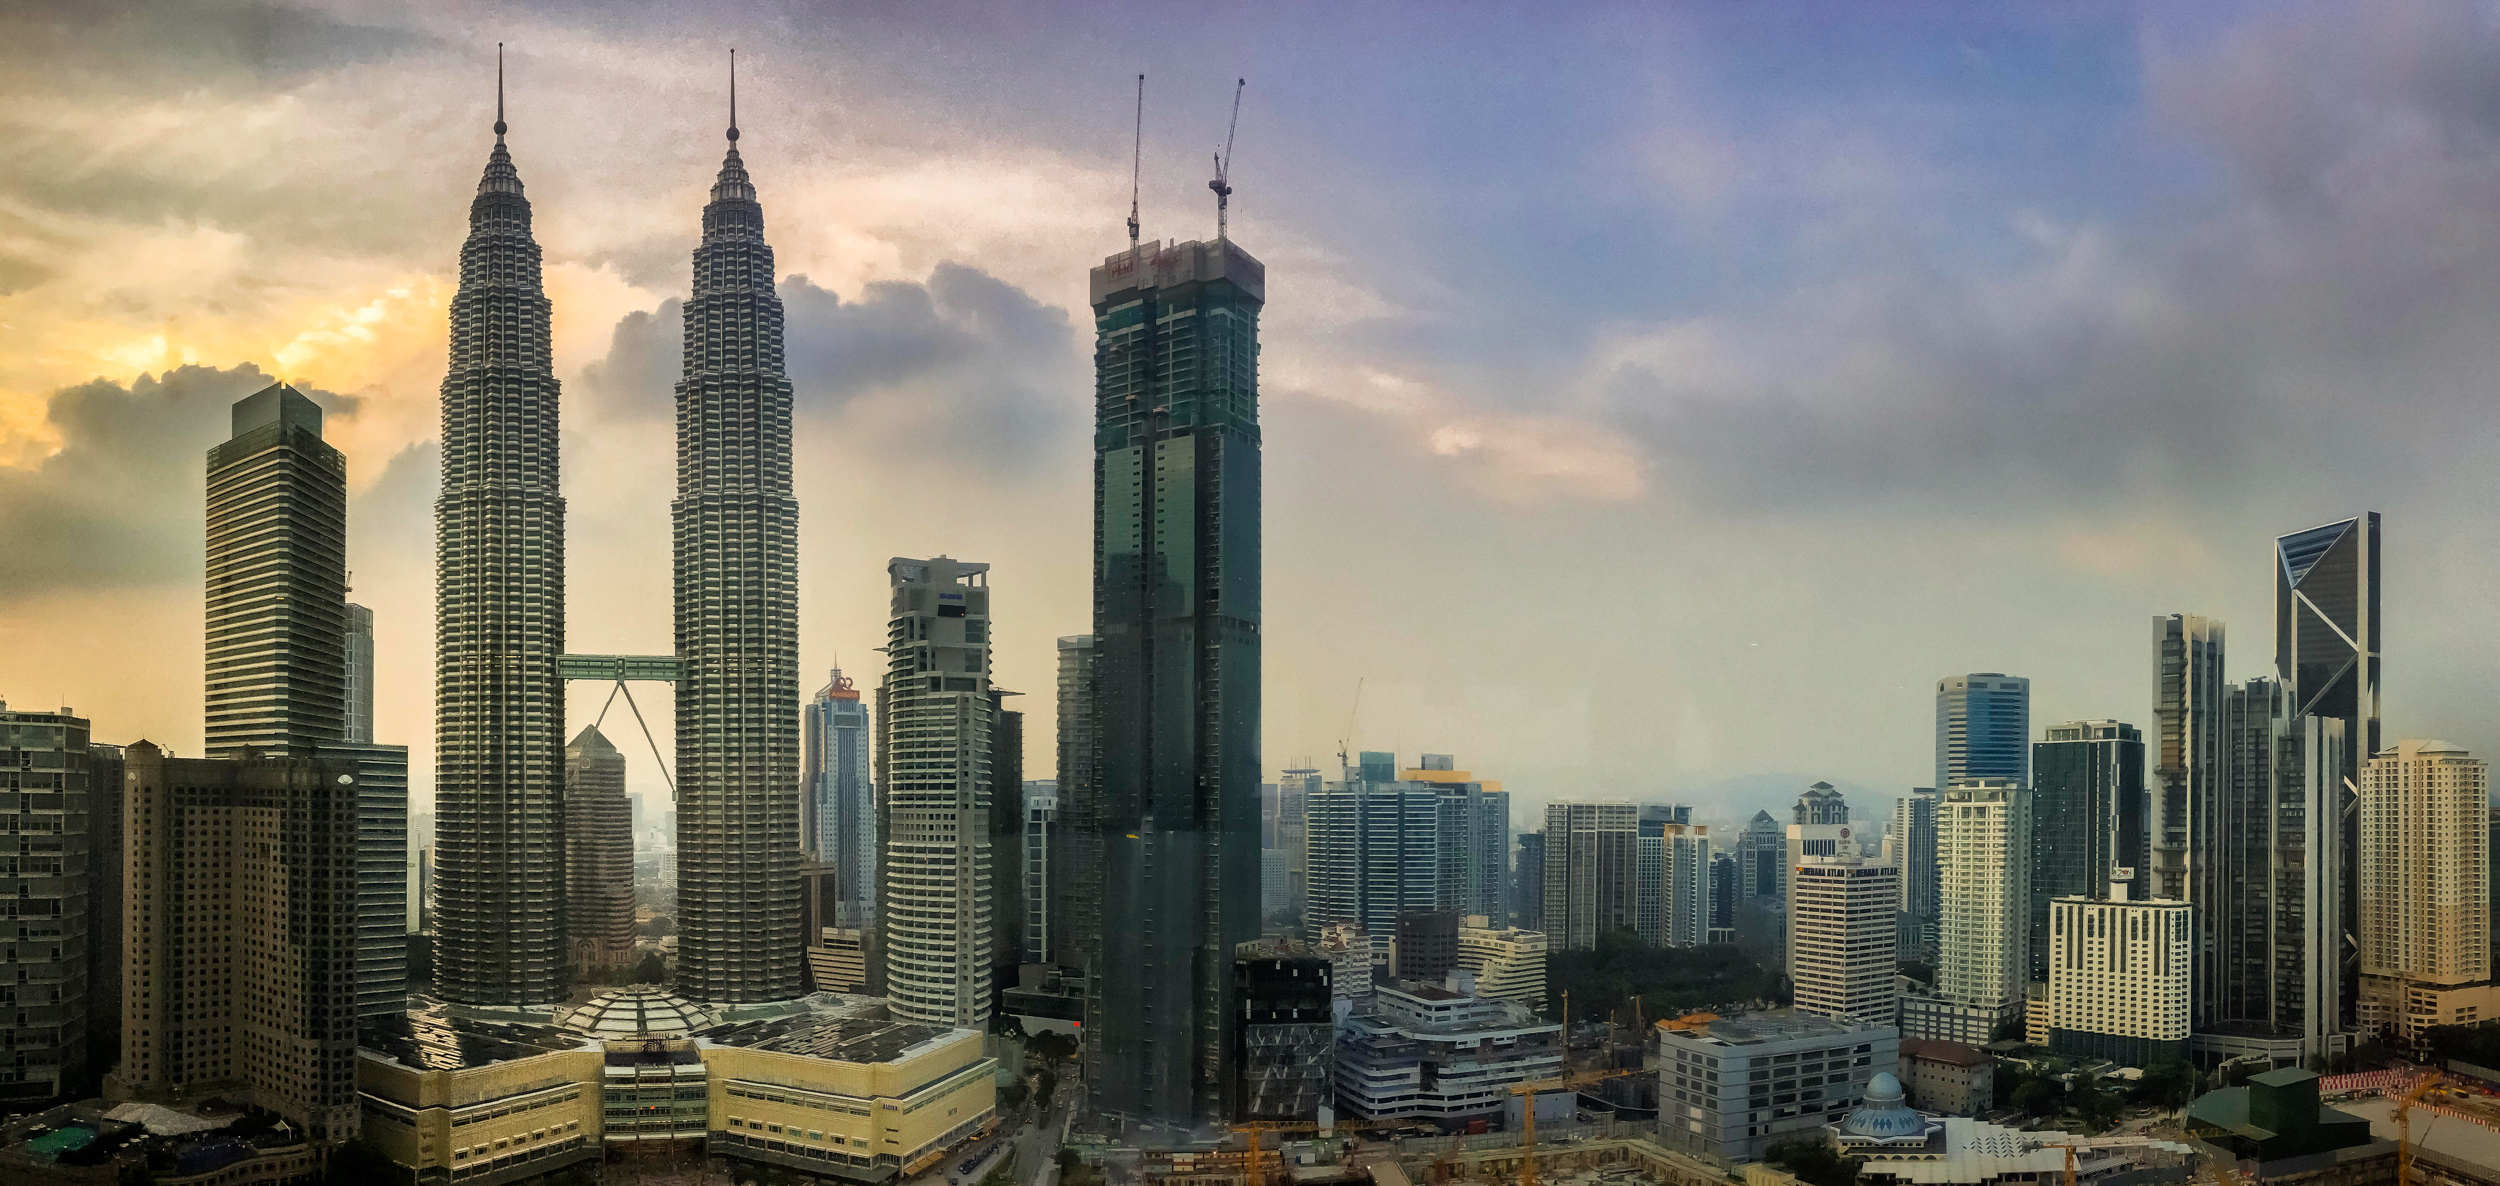 Futuristic KL city centre. Like a scene from Blade Runner.